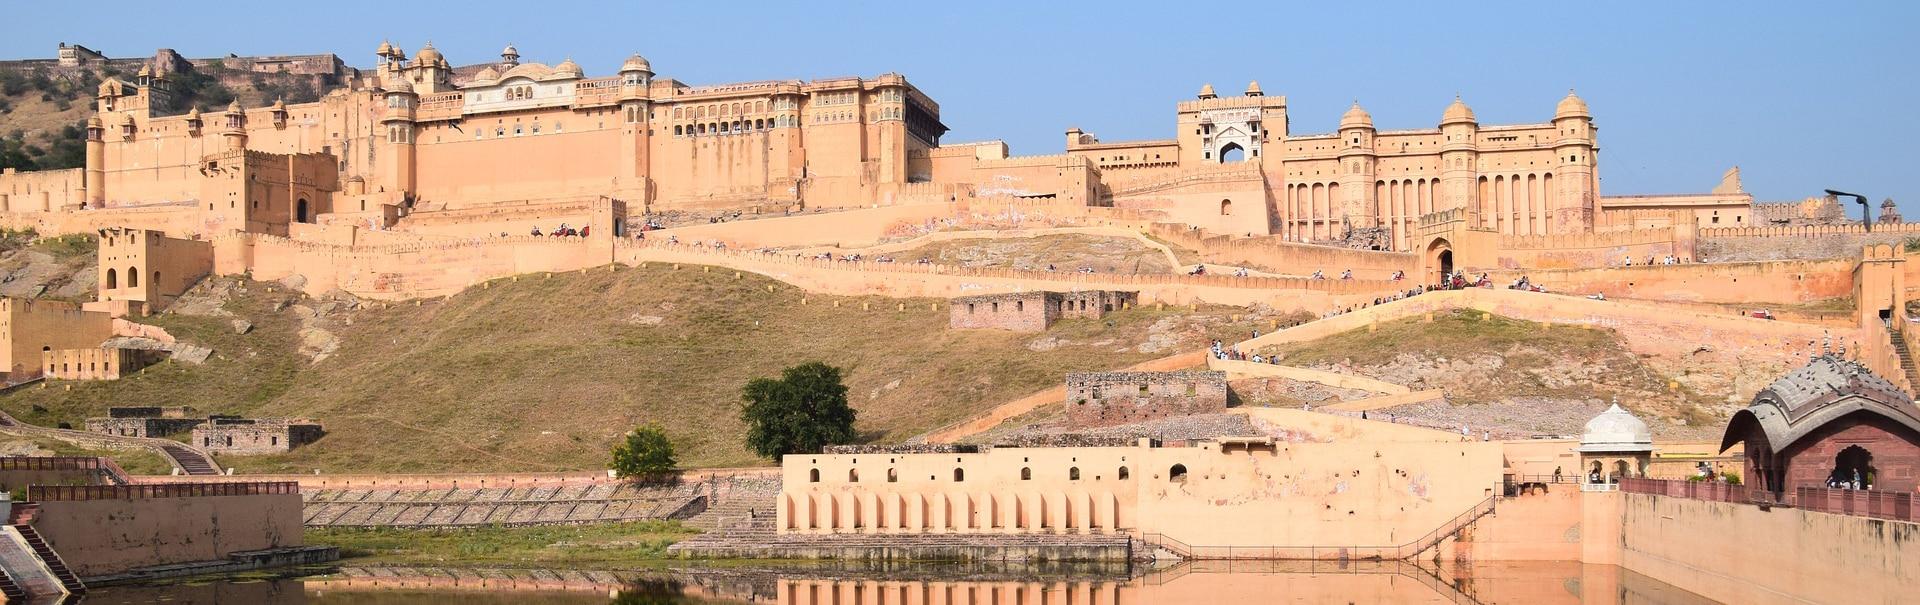 Rajasthan Mewad (SHRJ37) Banner